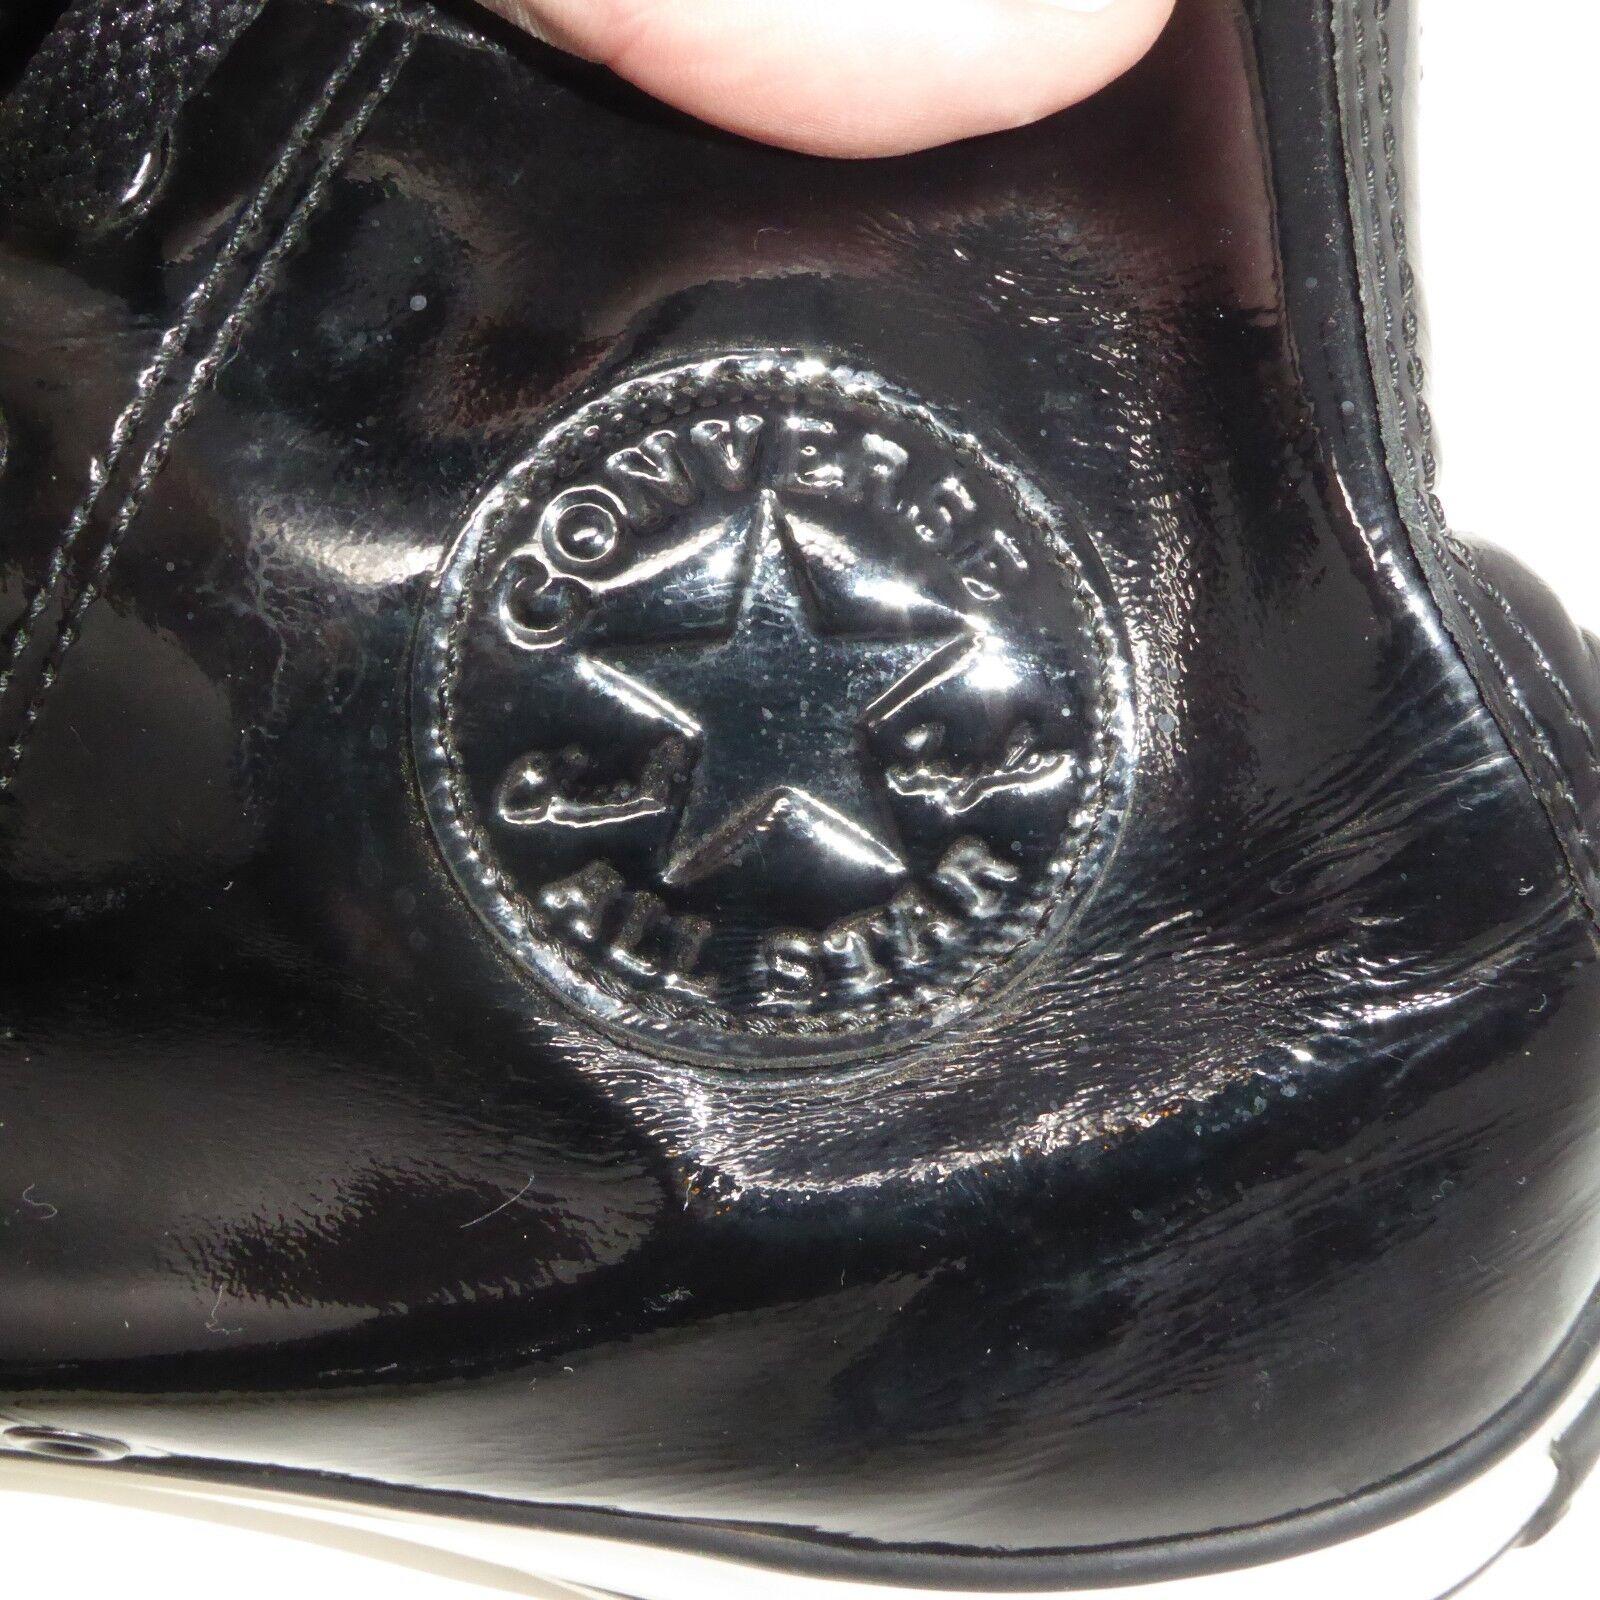 PVC CONVERSE CHUCK TAYLOR ALL STAR HIGH SHOES TOP BLACK SHOES HIGH SNEAKERS Sz 10 Dominatri 23e788